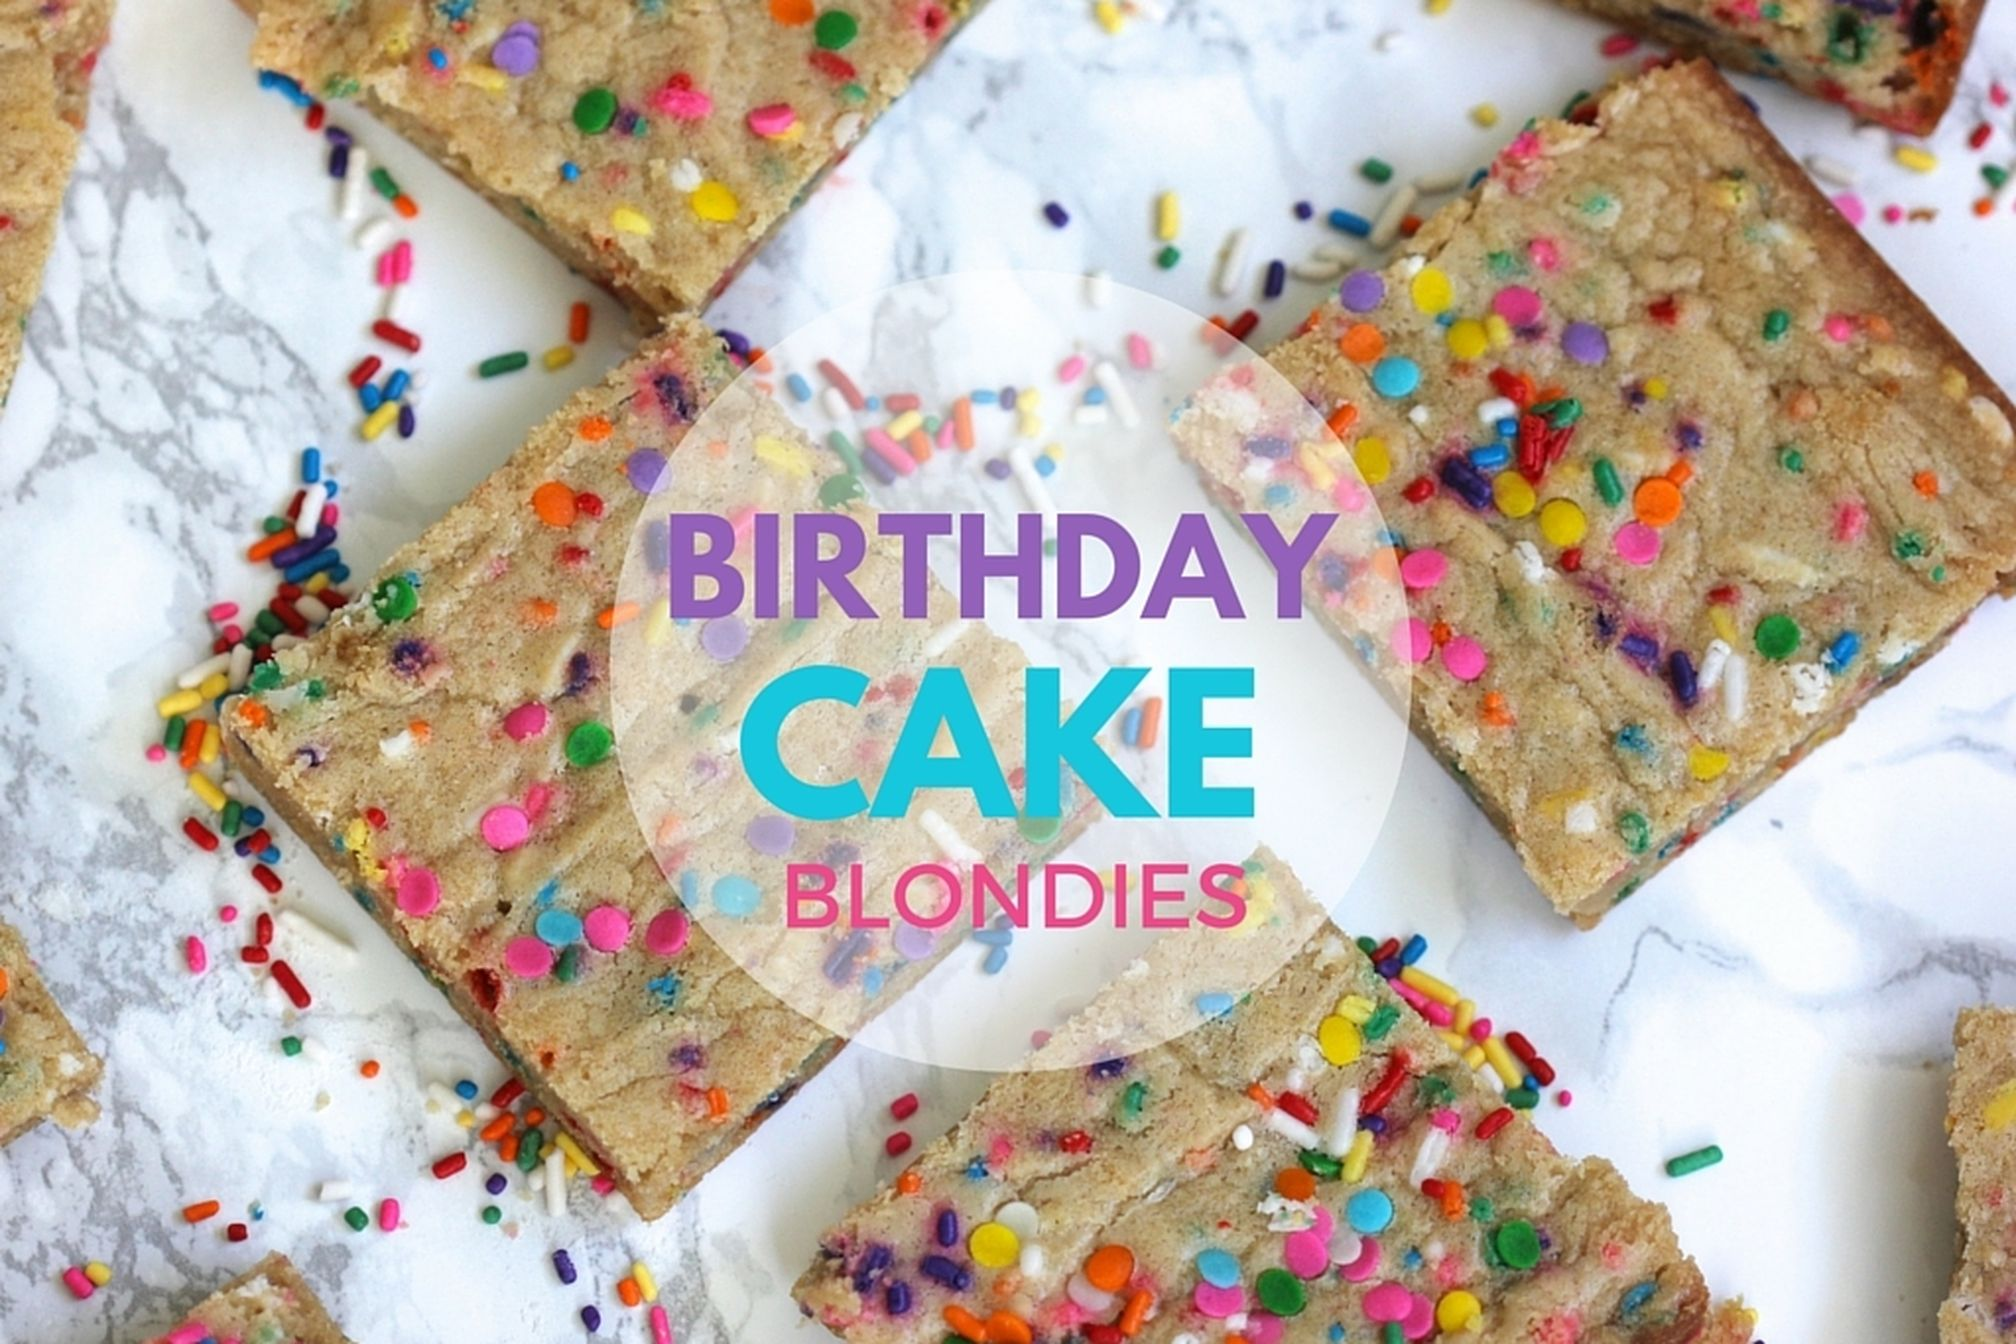 Enjoyable Birthday Cake Blondies Recipe On Food52 Funny Birthday Cards Online Fluifree Goldxyz